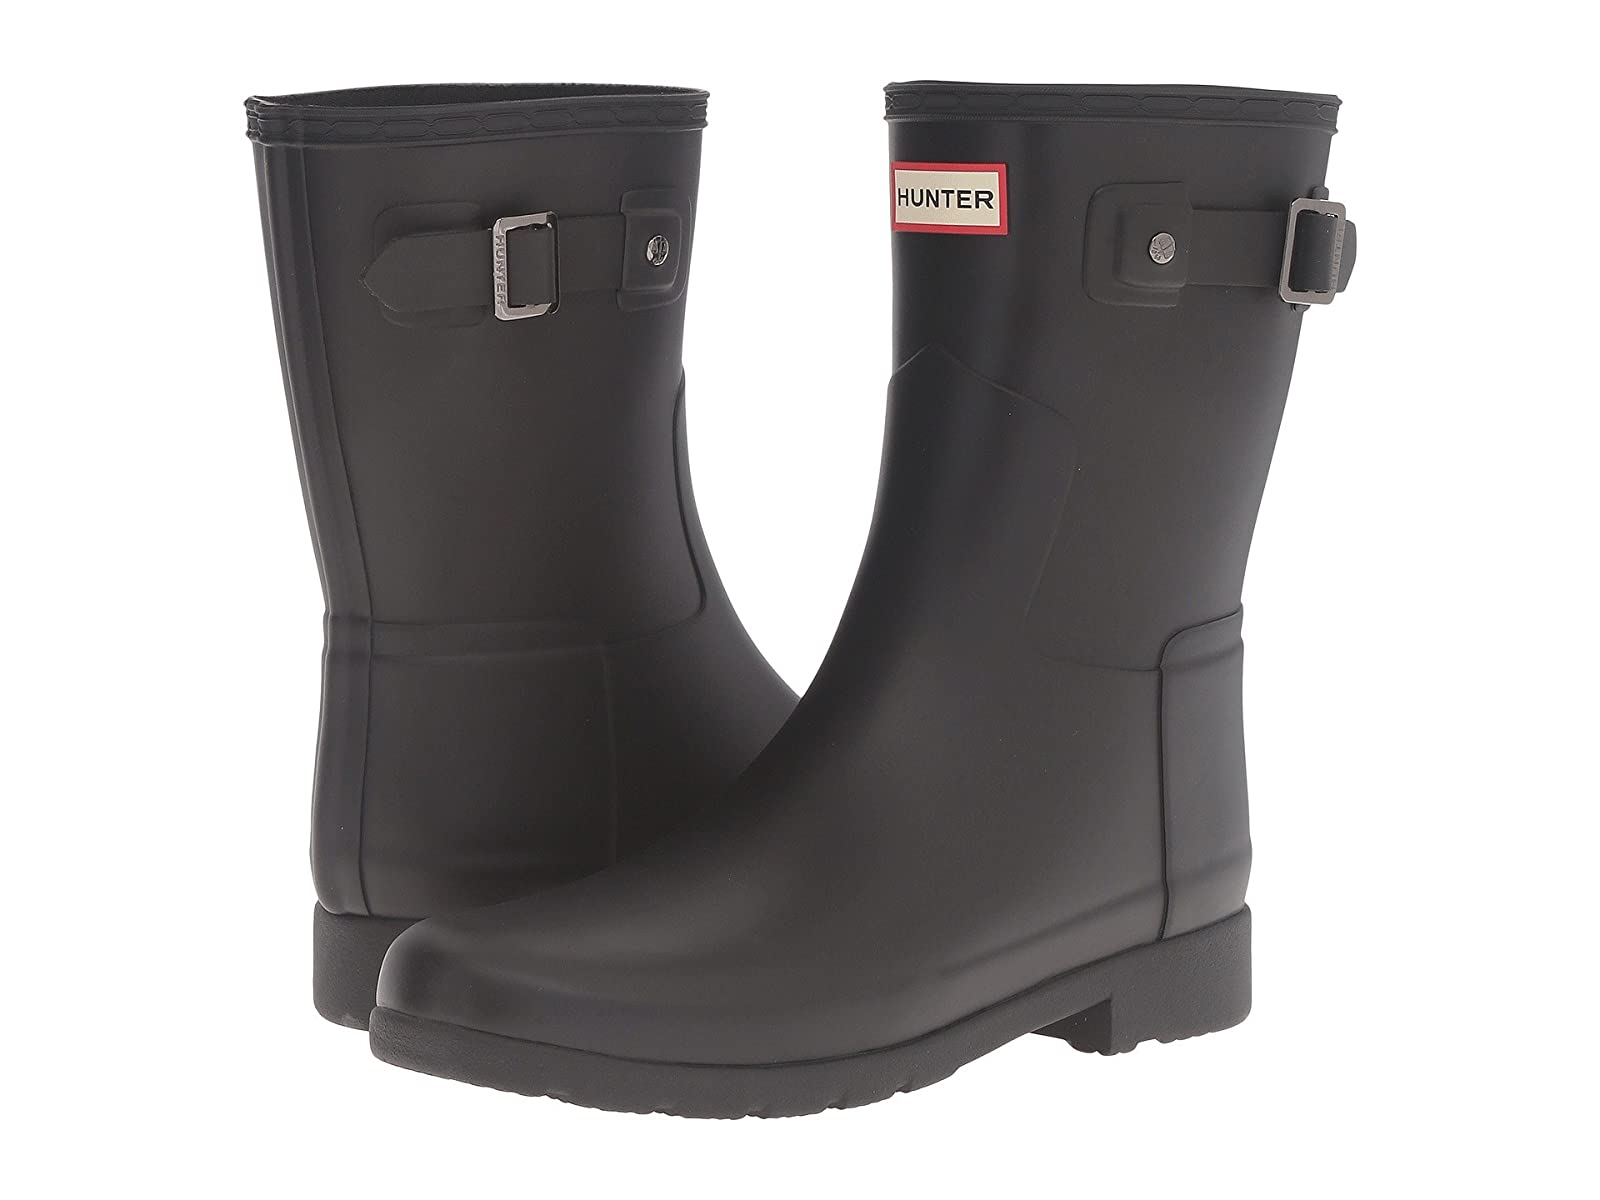 Hunter Original Refined Short Rain BootsAffordable and distinctive shoes